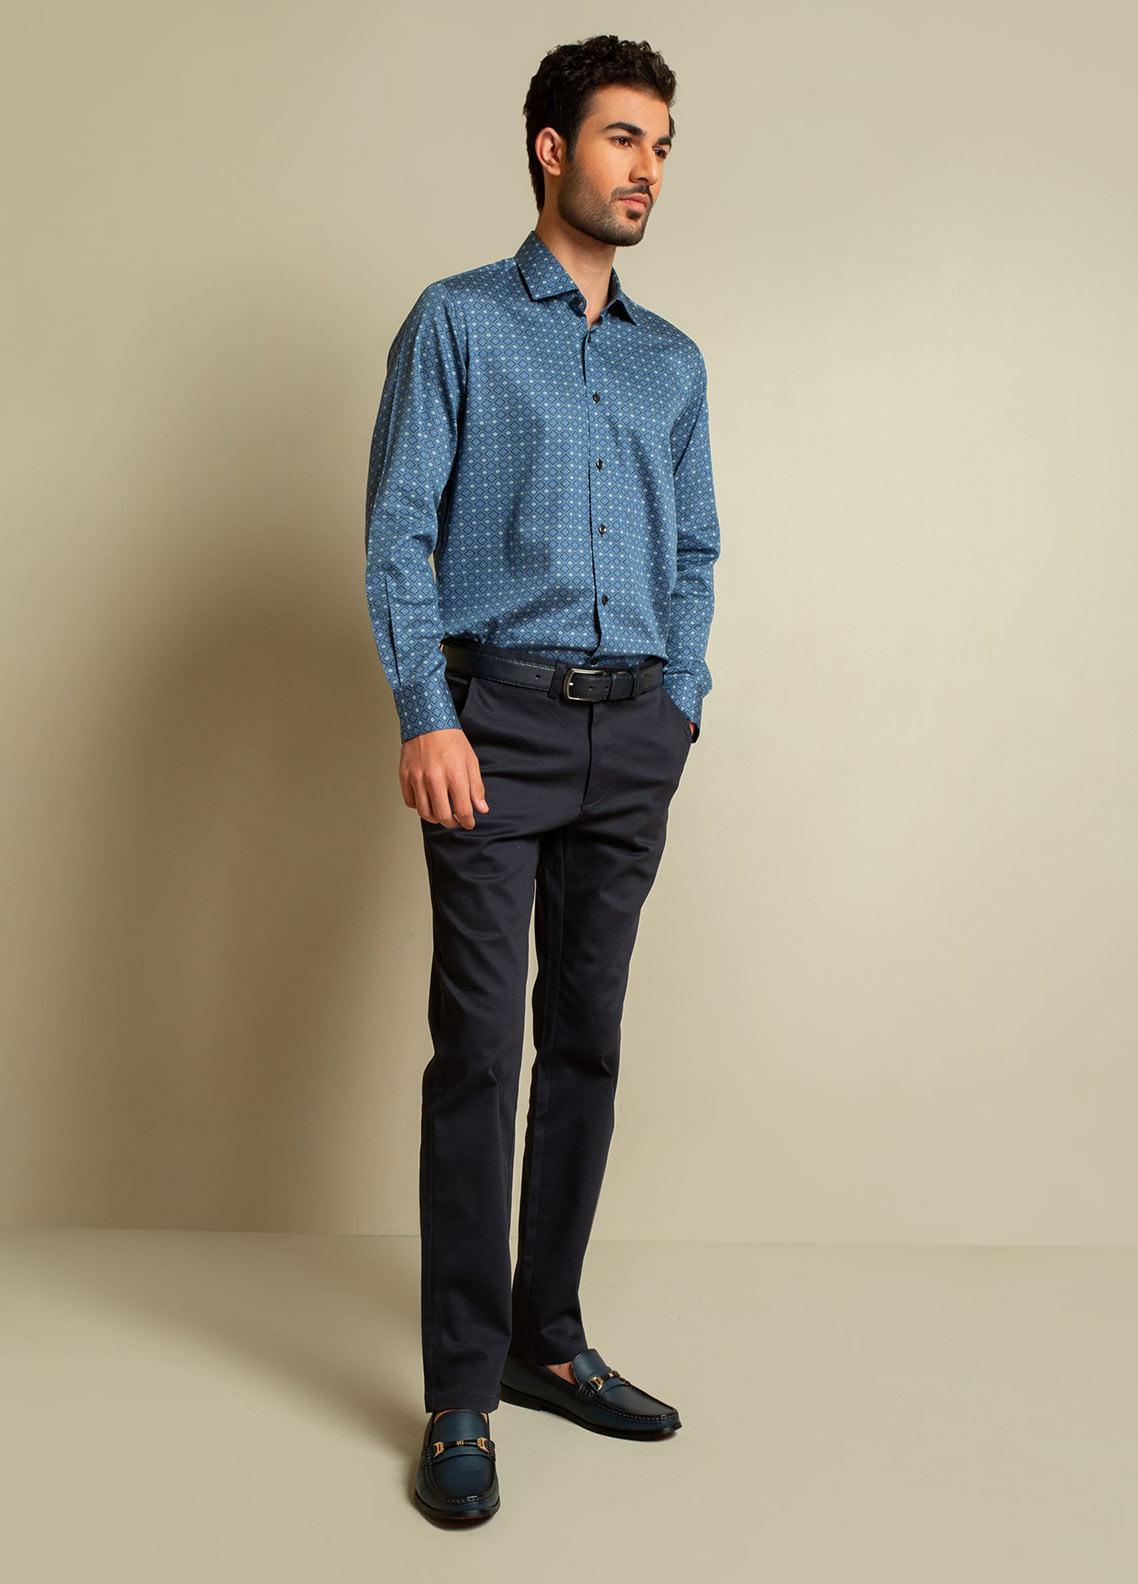 Brumano Cotton Formal Shirts for Men -  BM20SH Navy Blue Geometric Printed Shirt